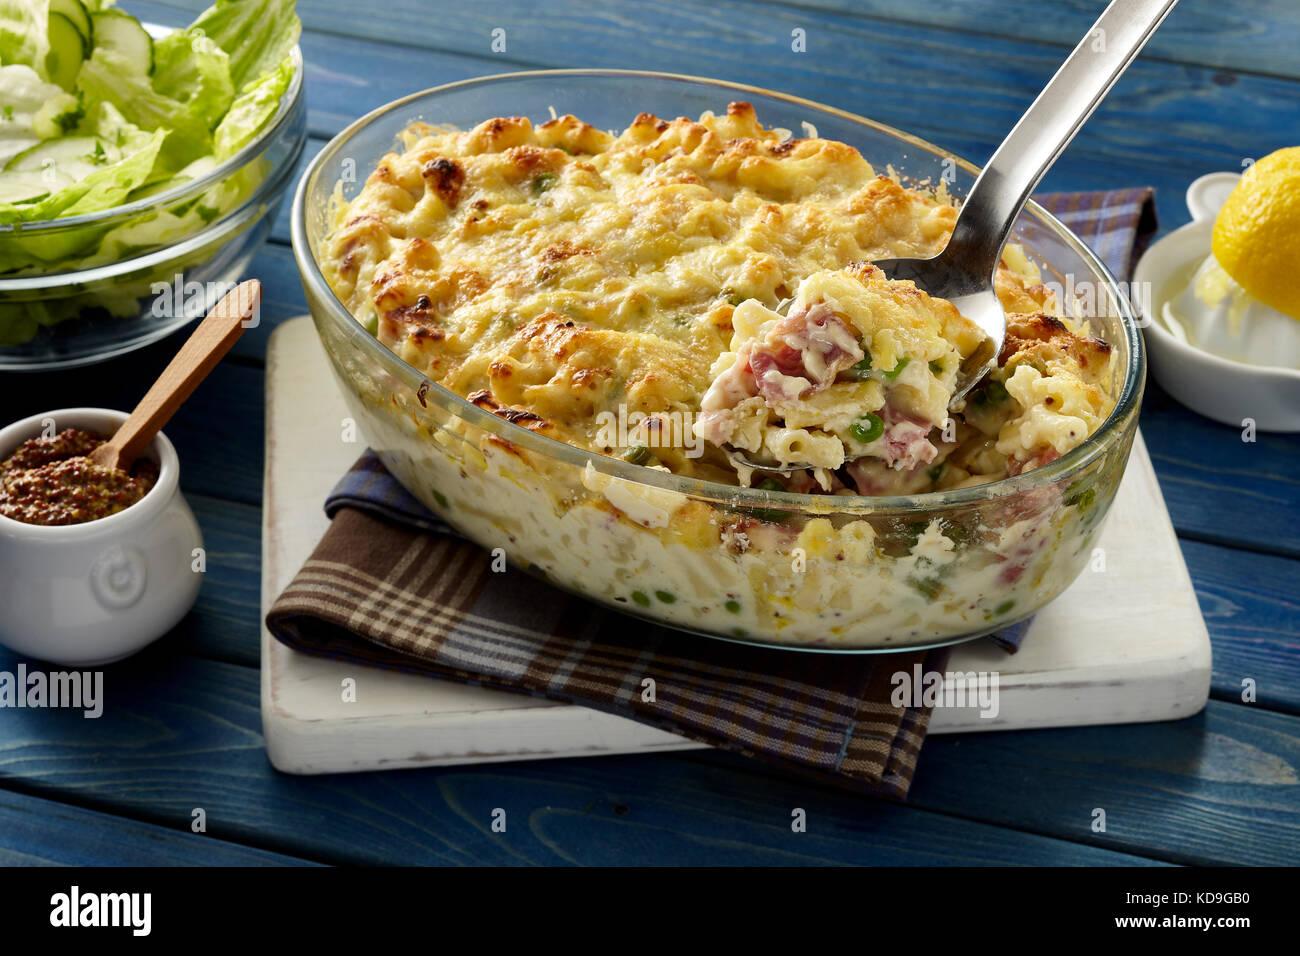 Macaroni and cheese - Stock Image